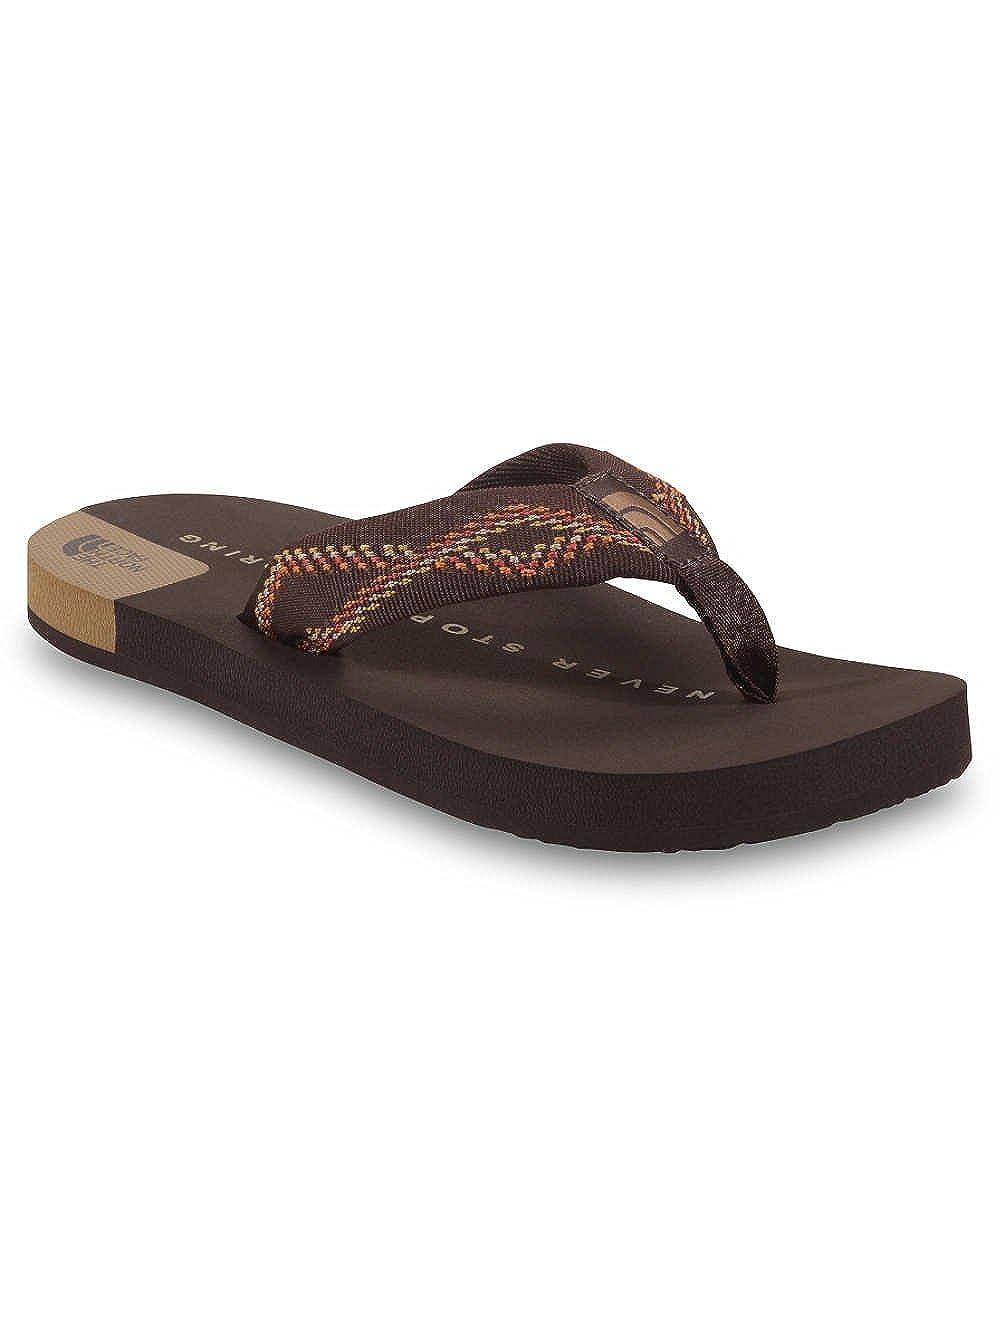 c1b83ca74 THE NORTH FACE Sandals Men Half Dune: Amazon.co.uk: Shoes & Bags